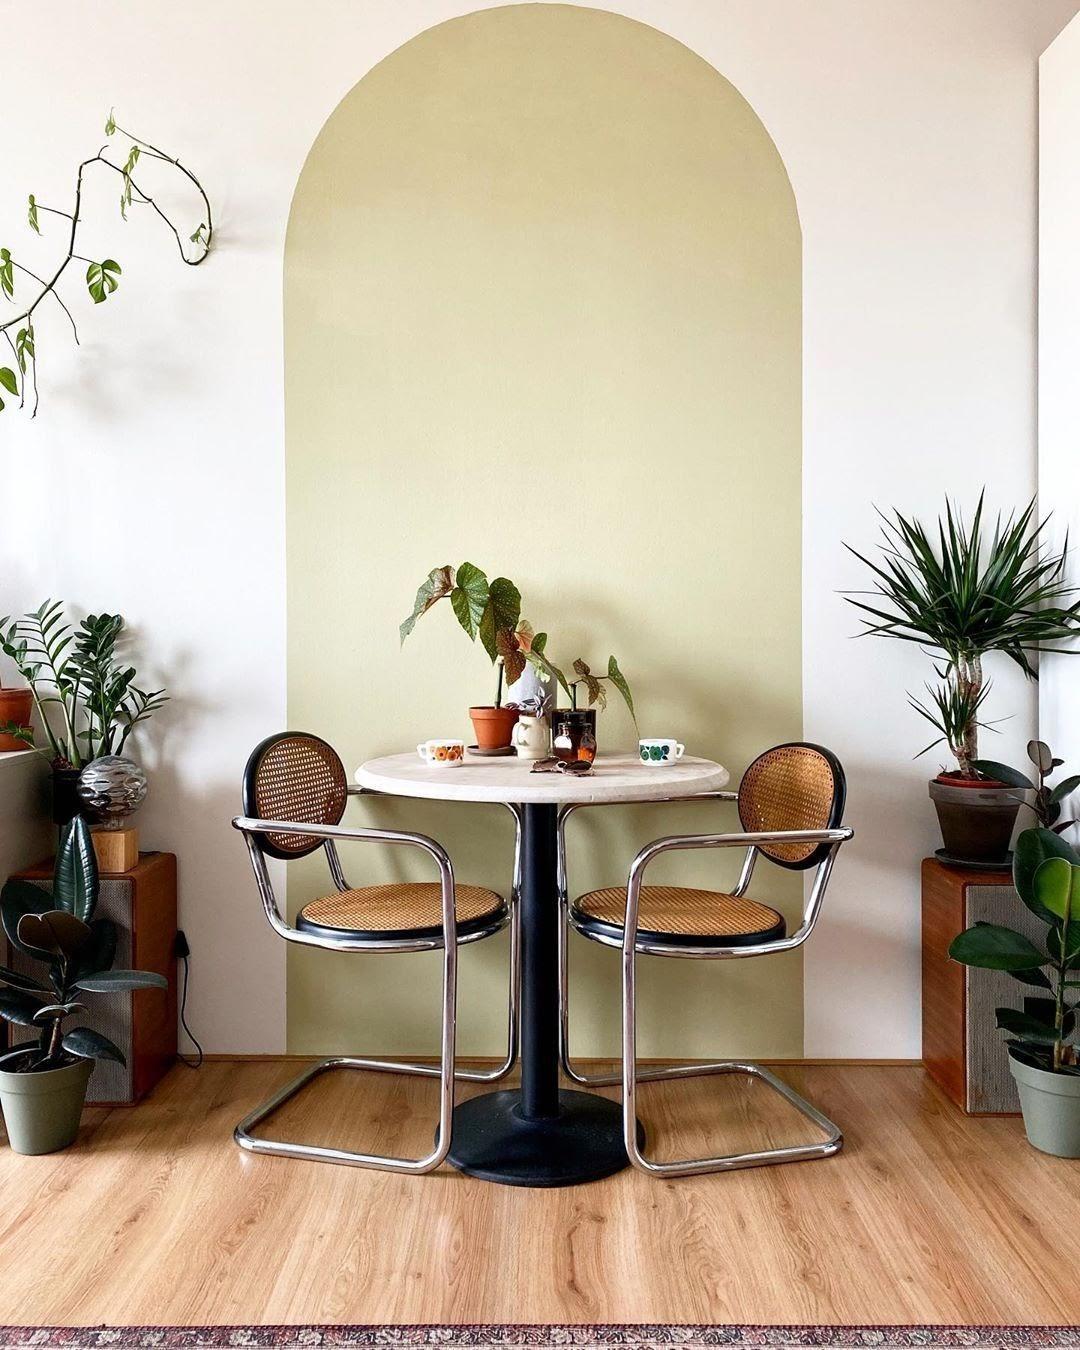 sala de jantar parede pintura geométrica arco